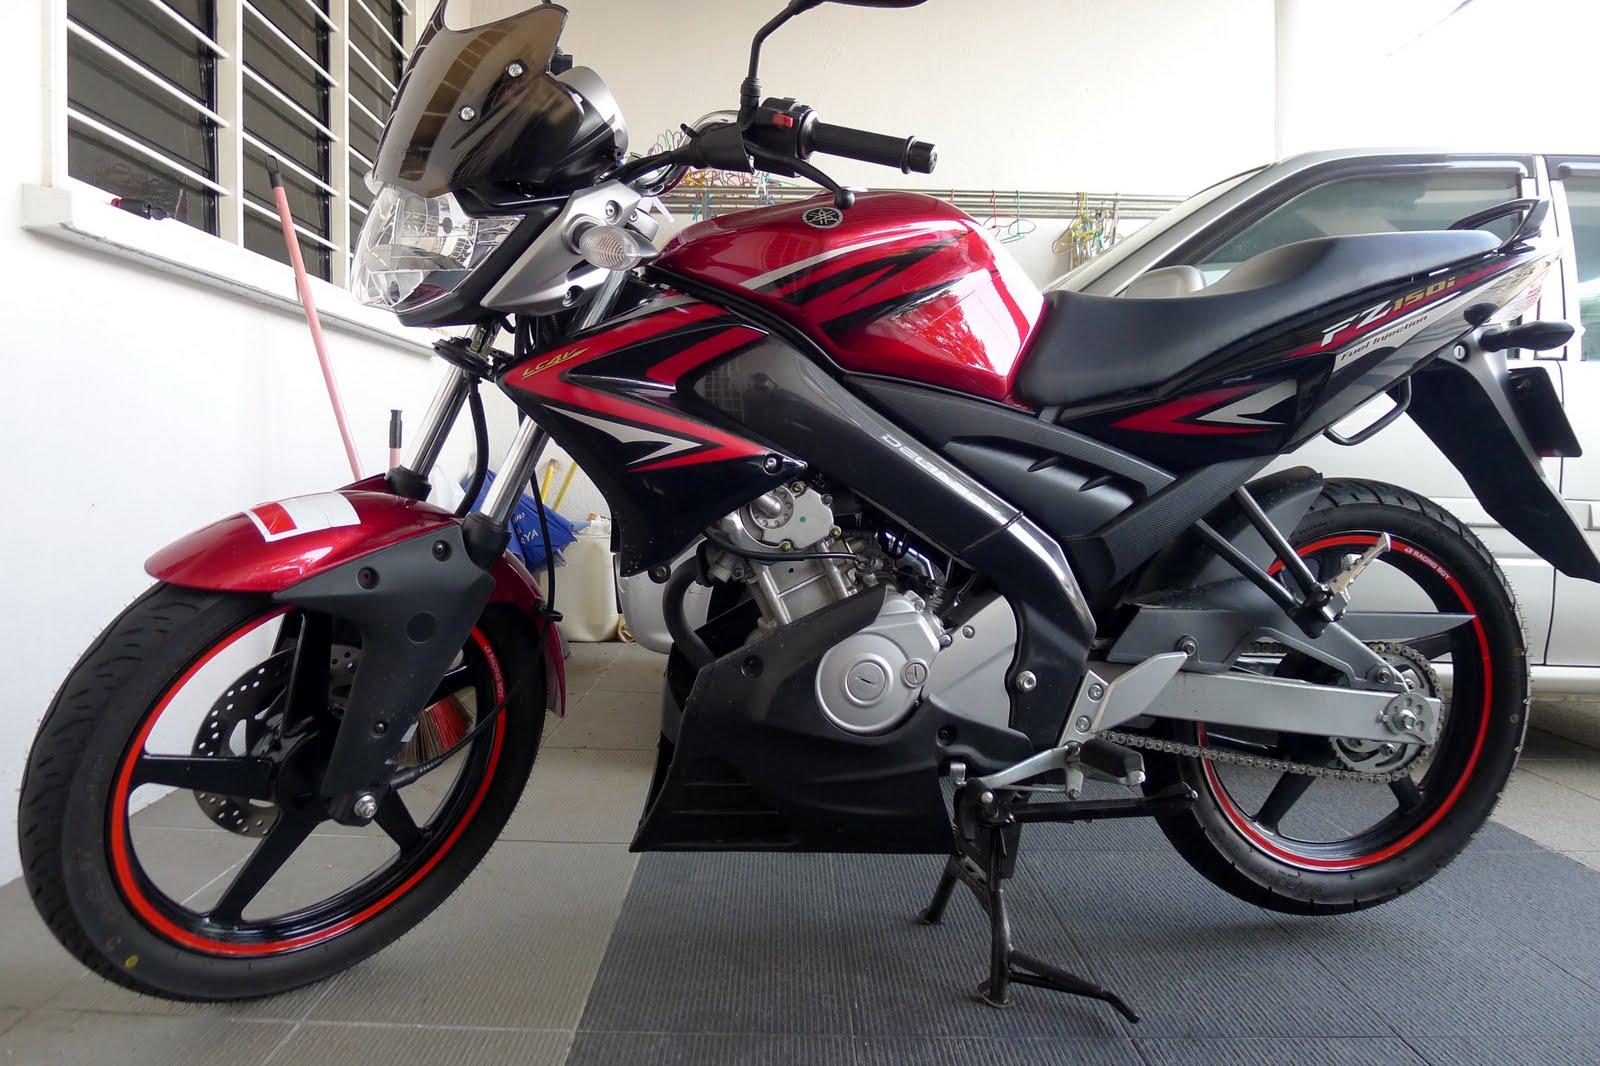 Yamaha Fz 150 Red